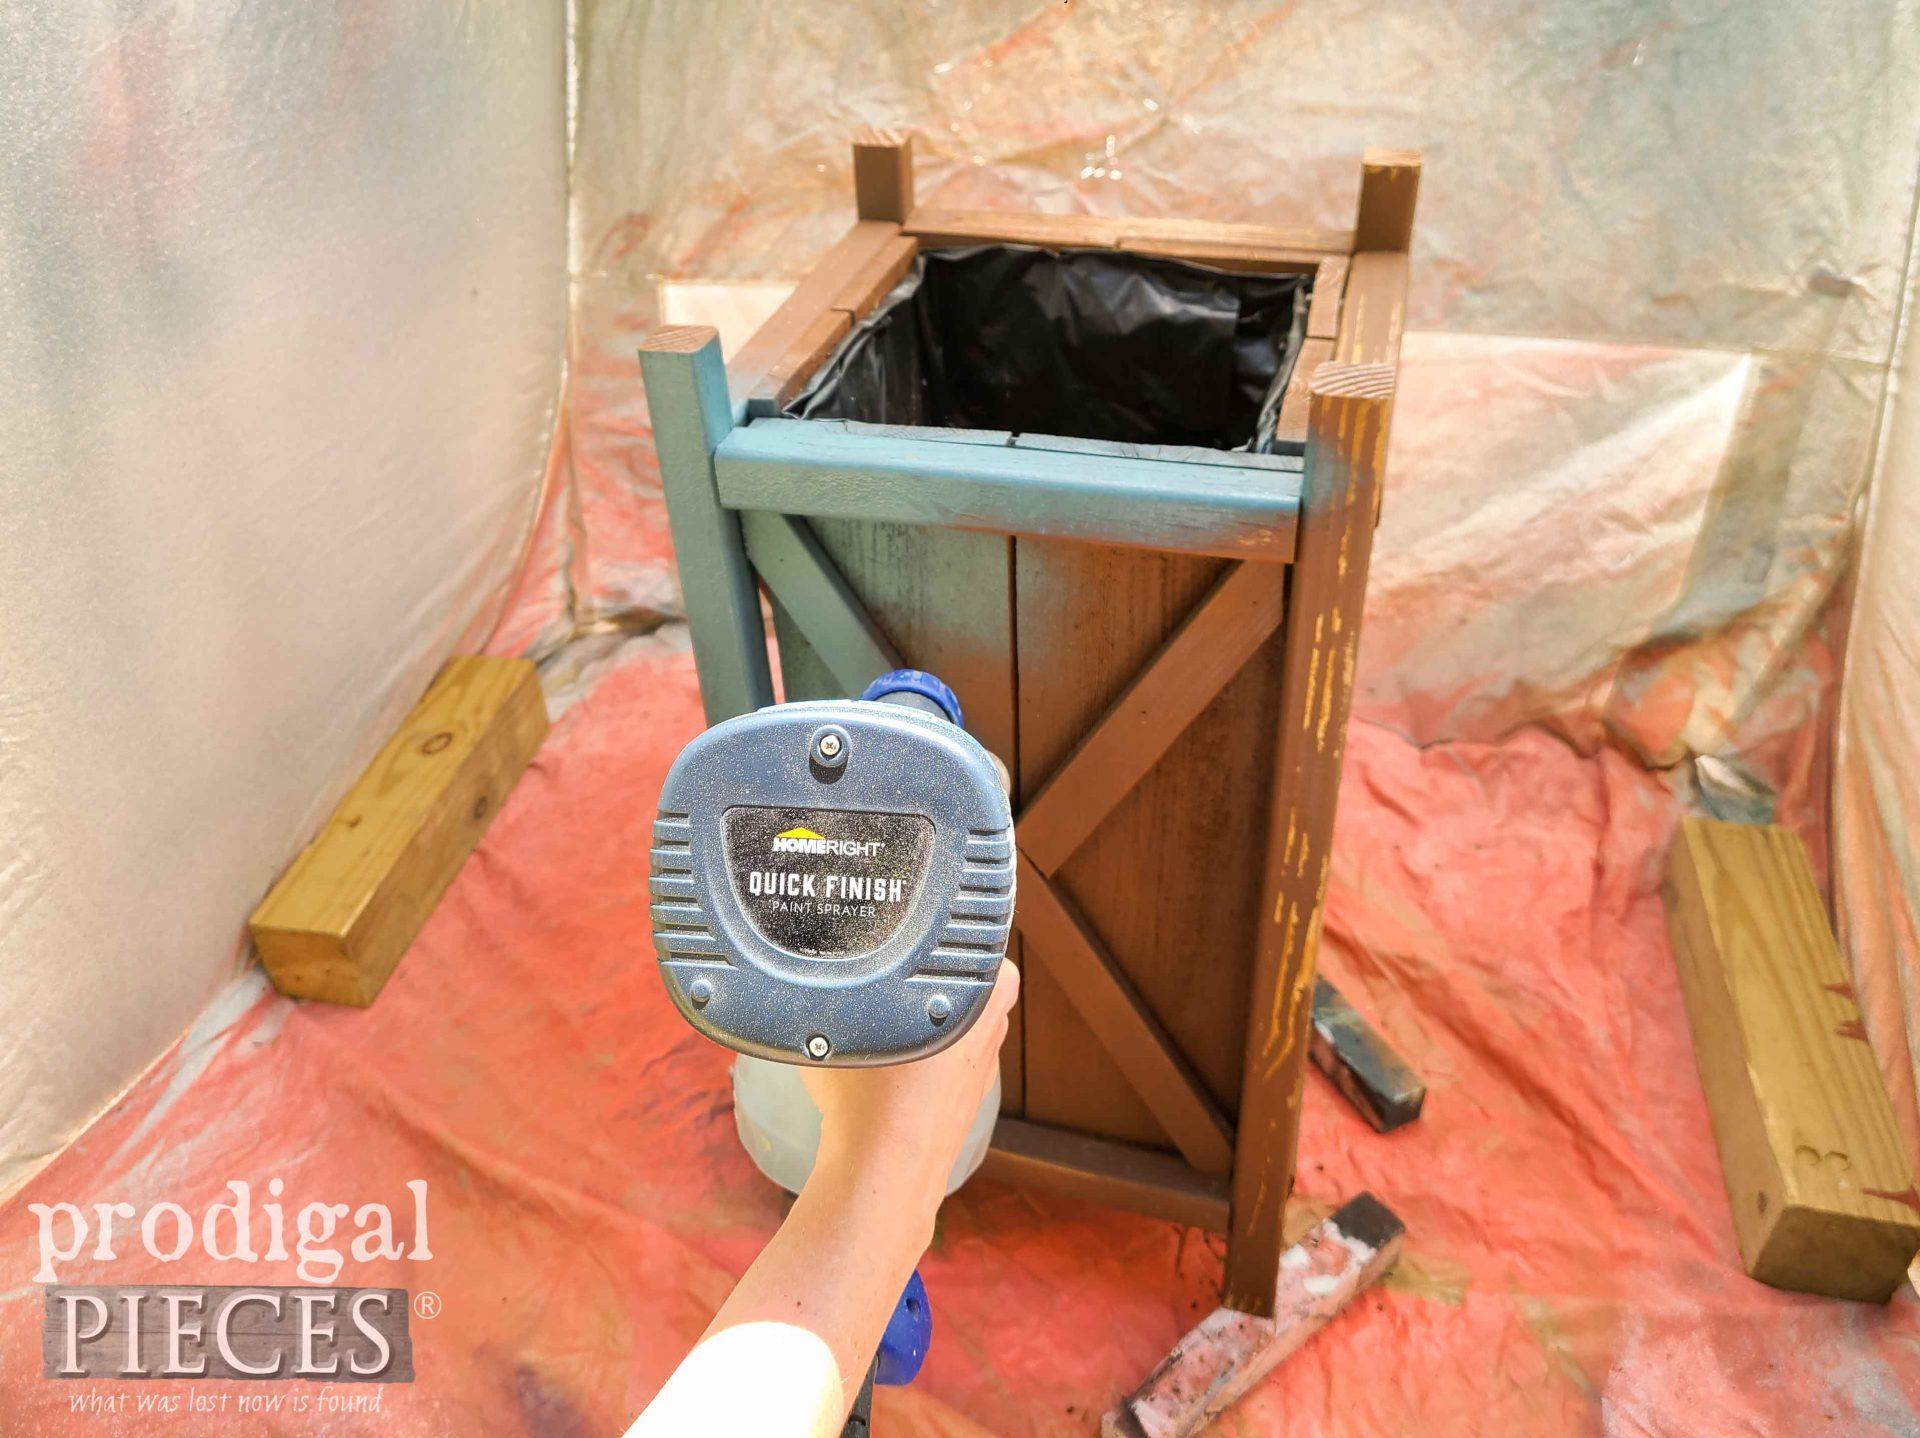 HomeRight Quick Finish Sprayer for Update Planters DIY by Larissa of Prodigal Pieces | prodigalpieces.com #prodigalpieces